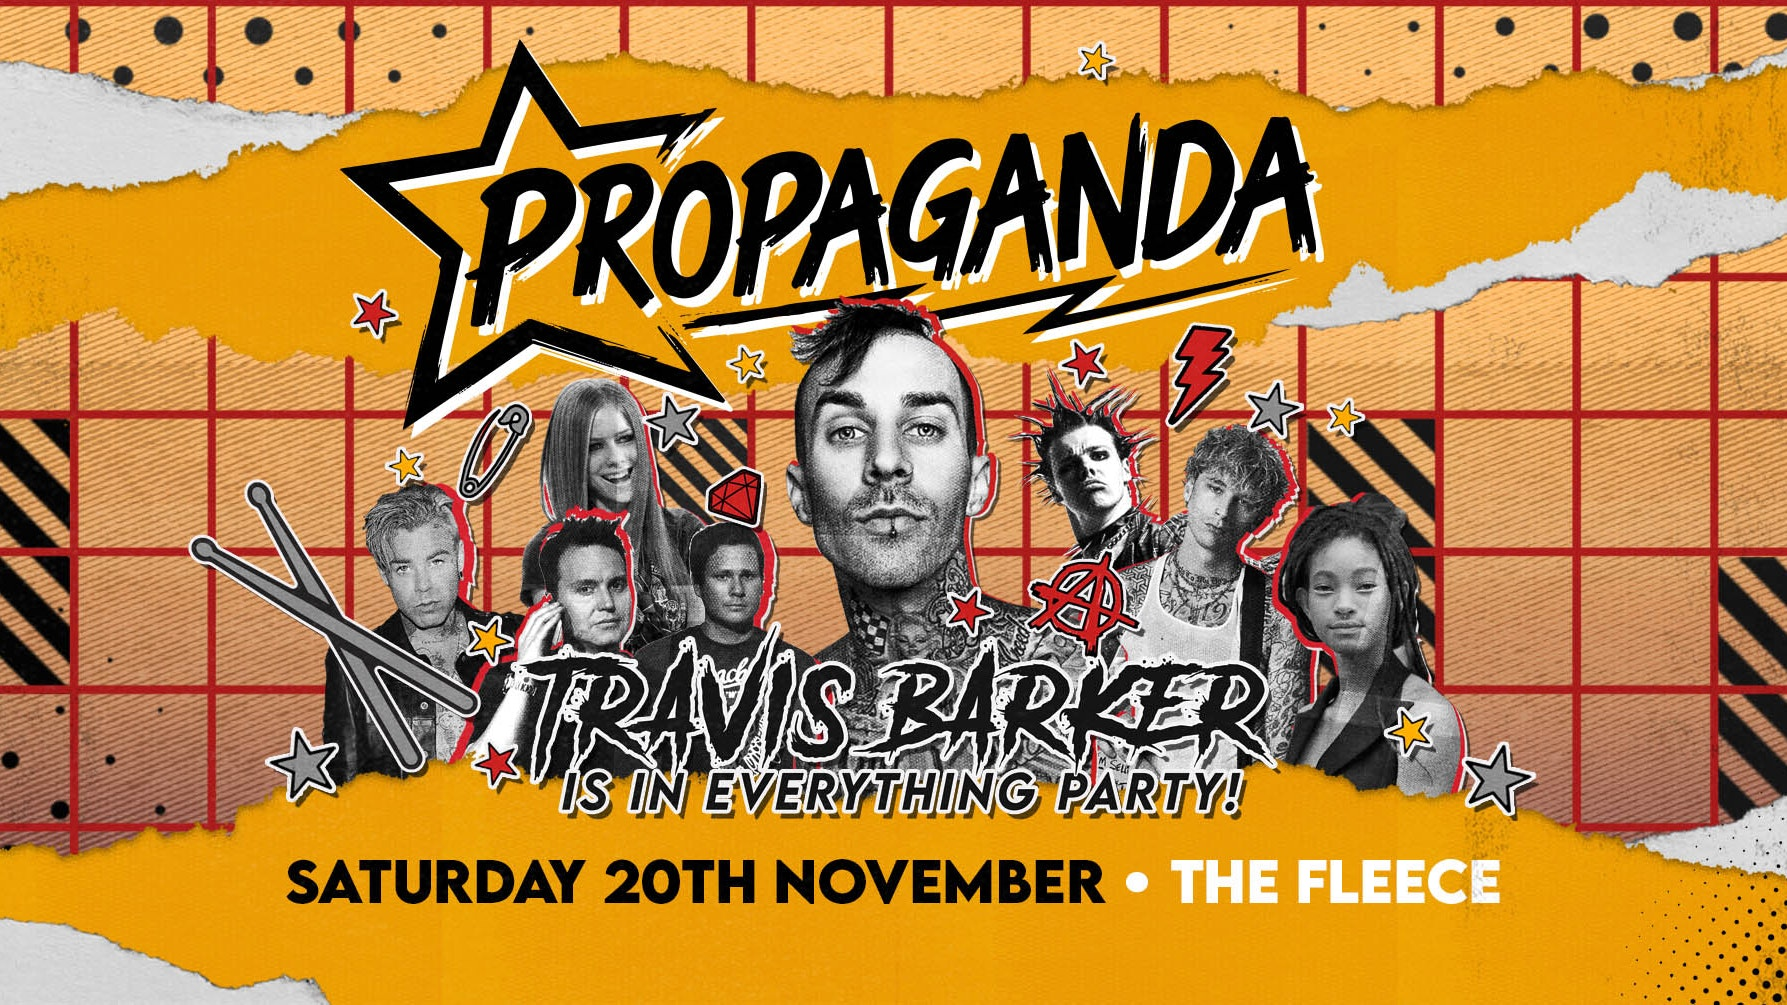 Propaganda Bristol – Travis Barker Is In Everything Party!